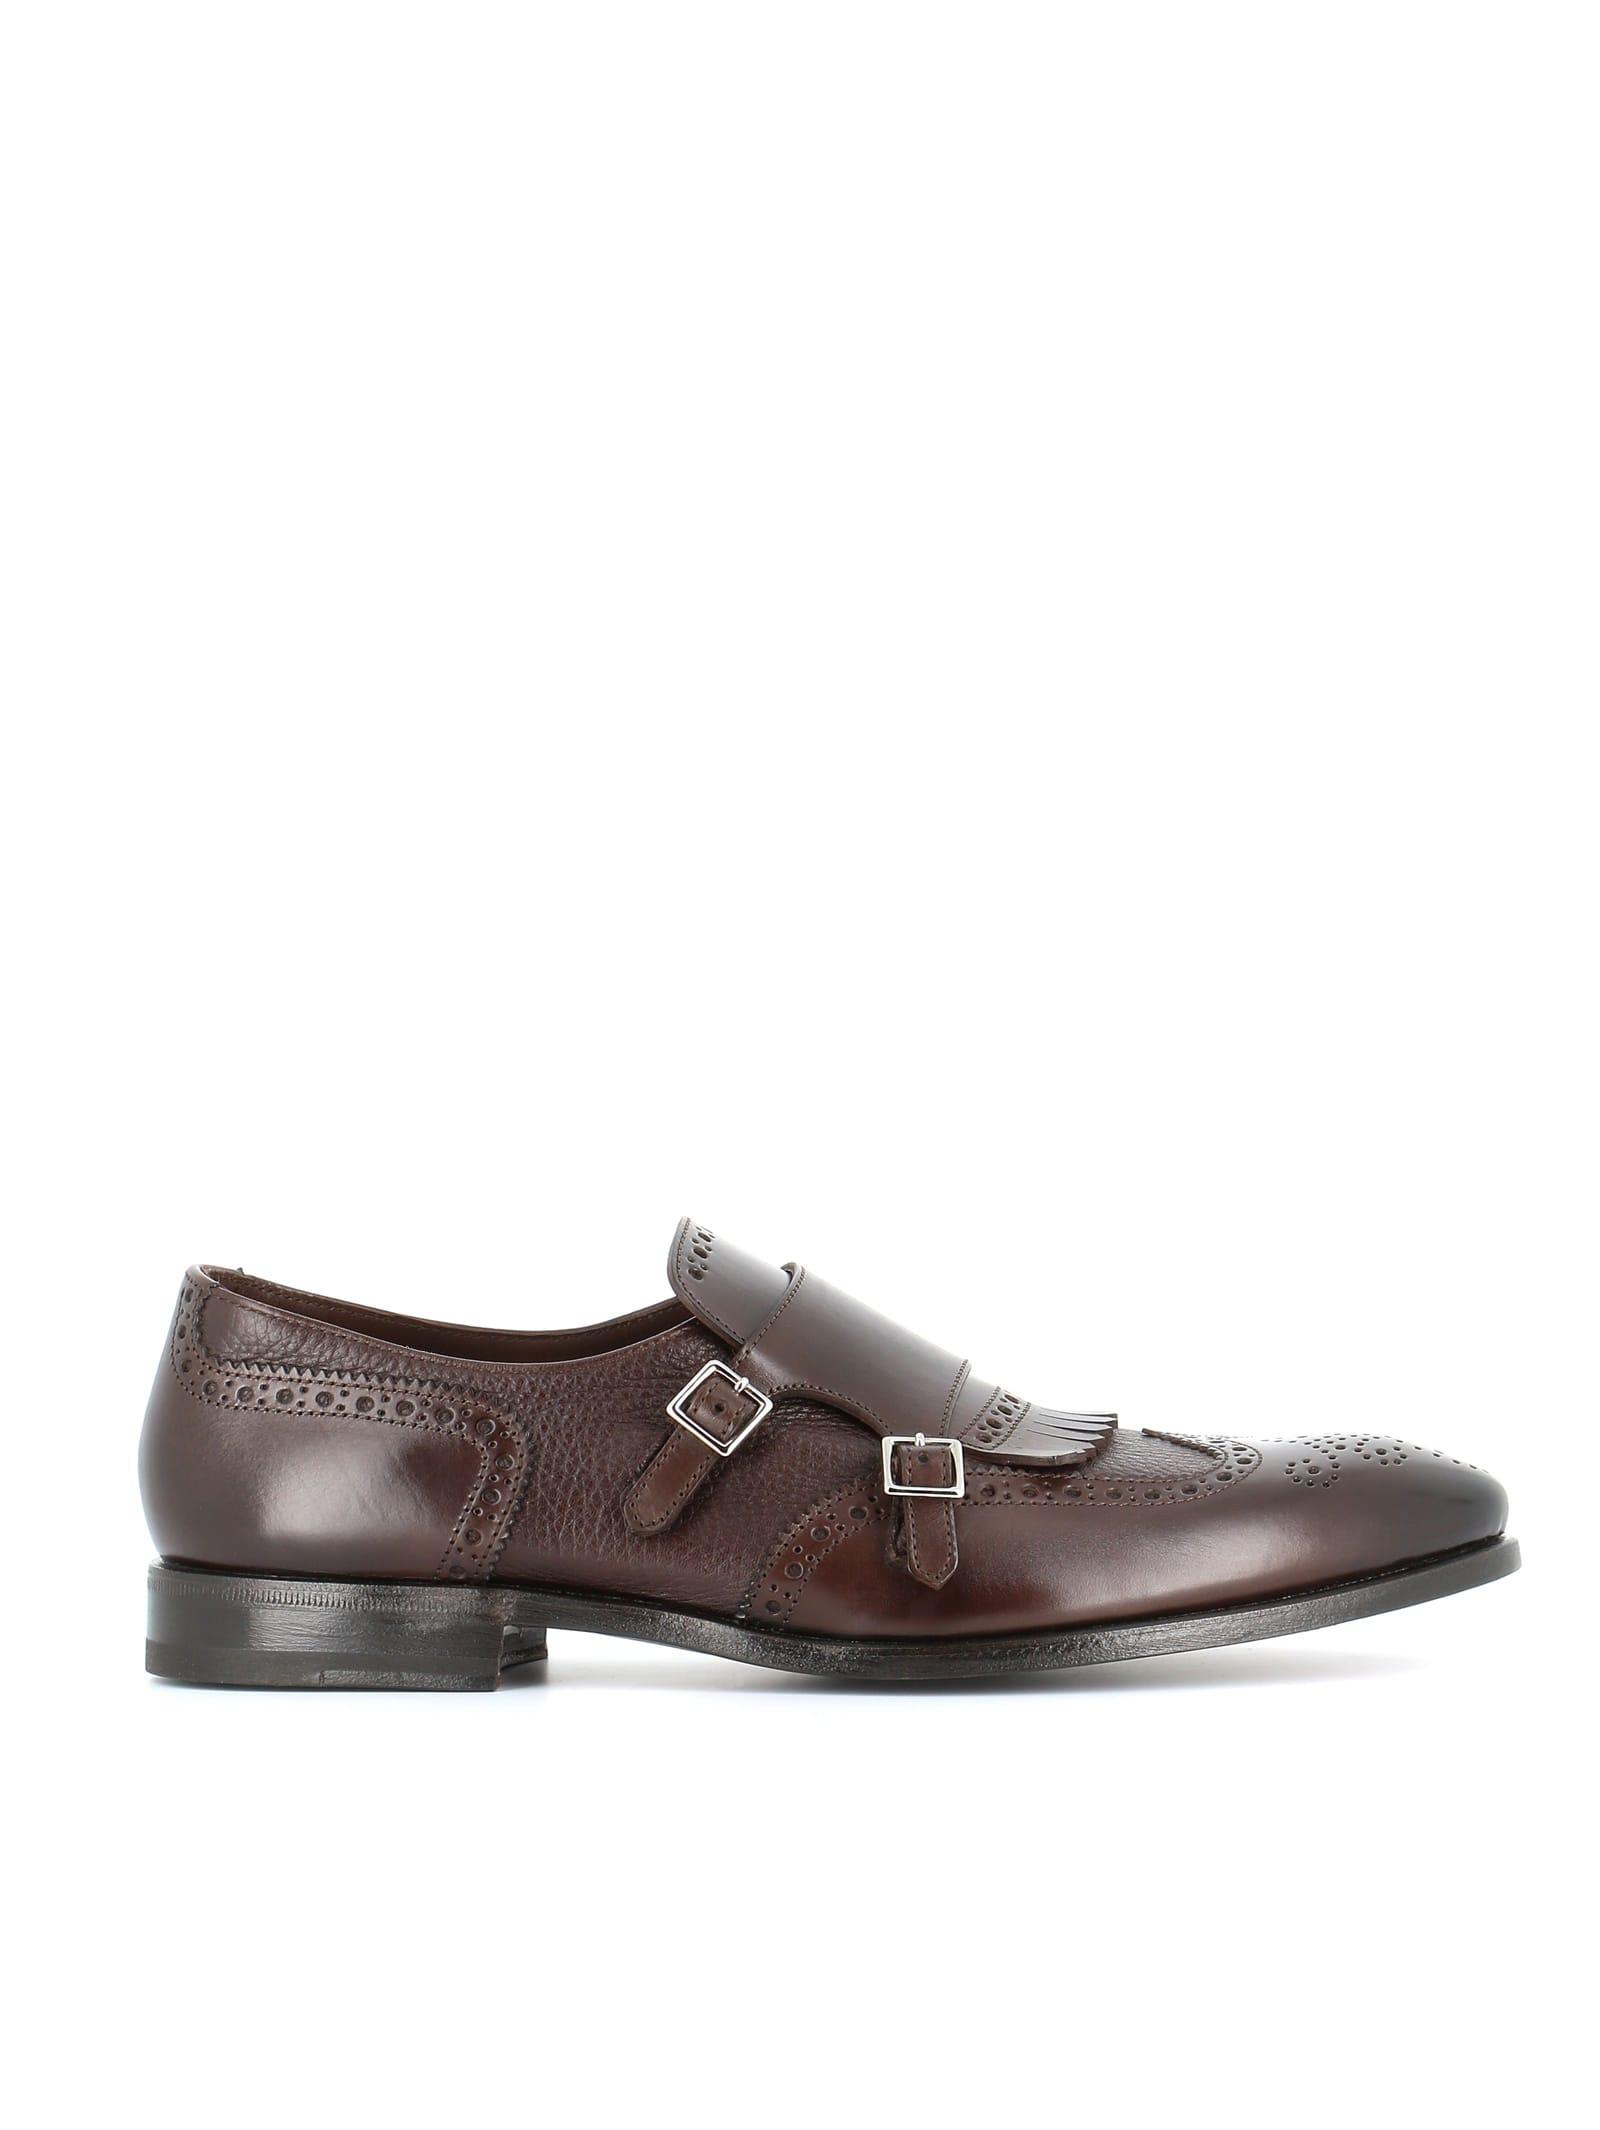 Henderson Baracco Henderson Baracco Monk Shoes 67426.7